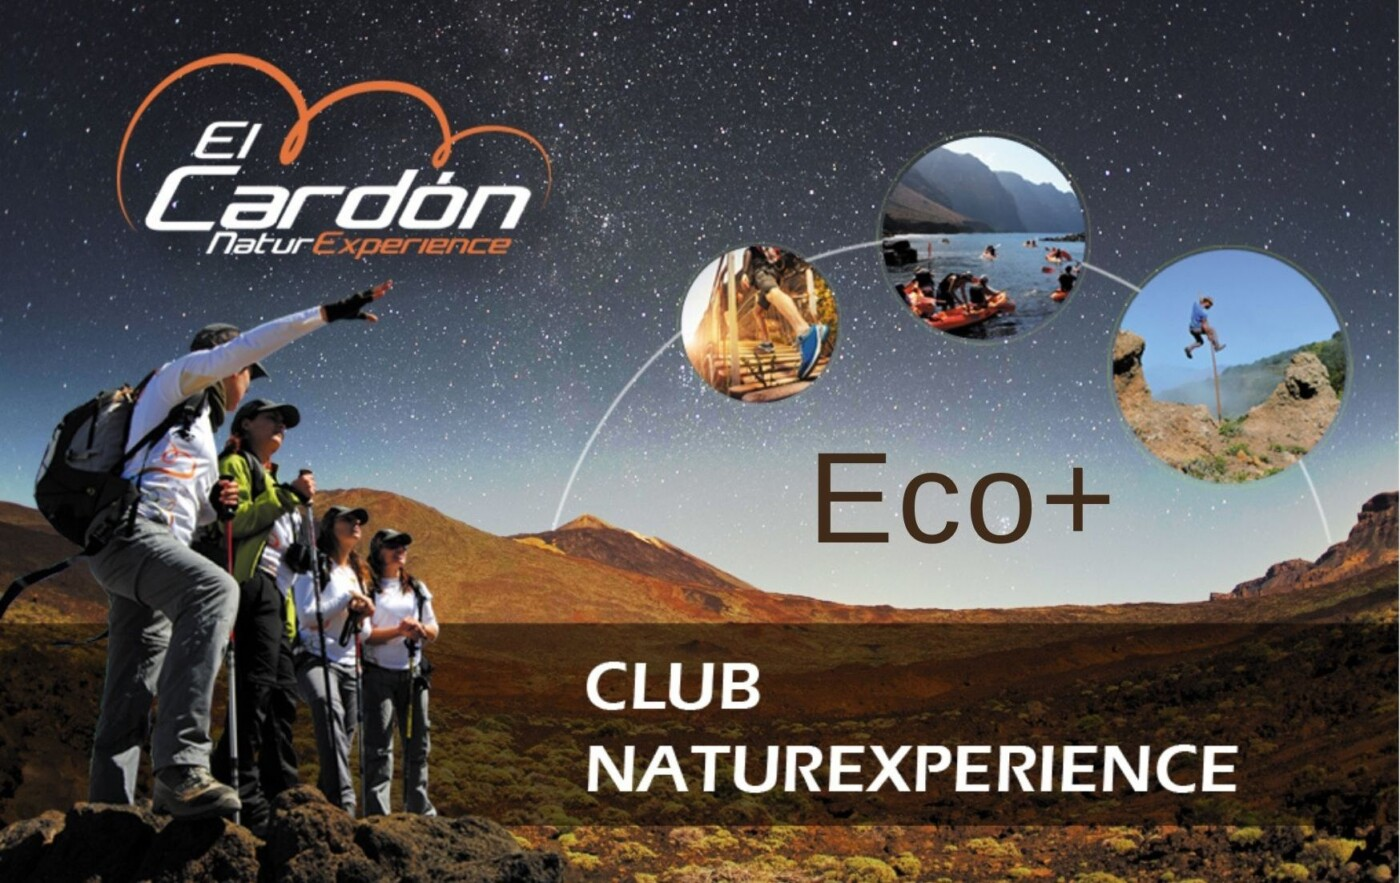 Club NaturExperience Eco